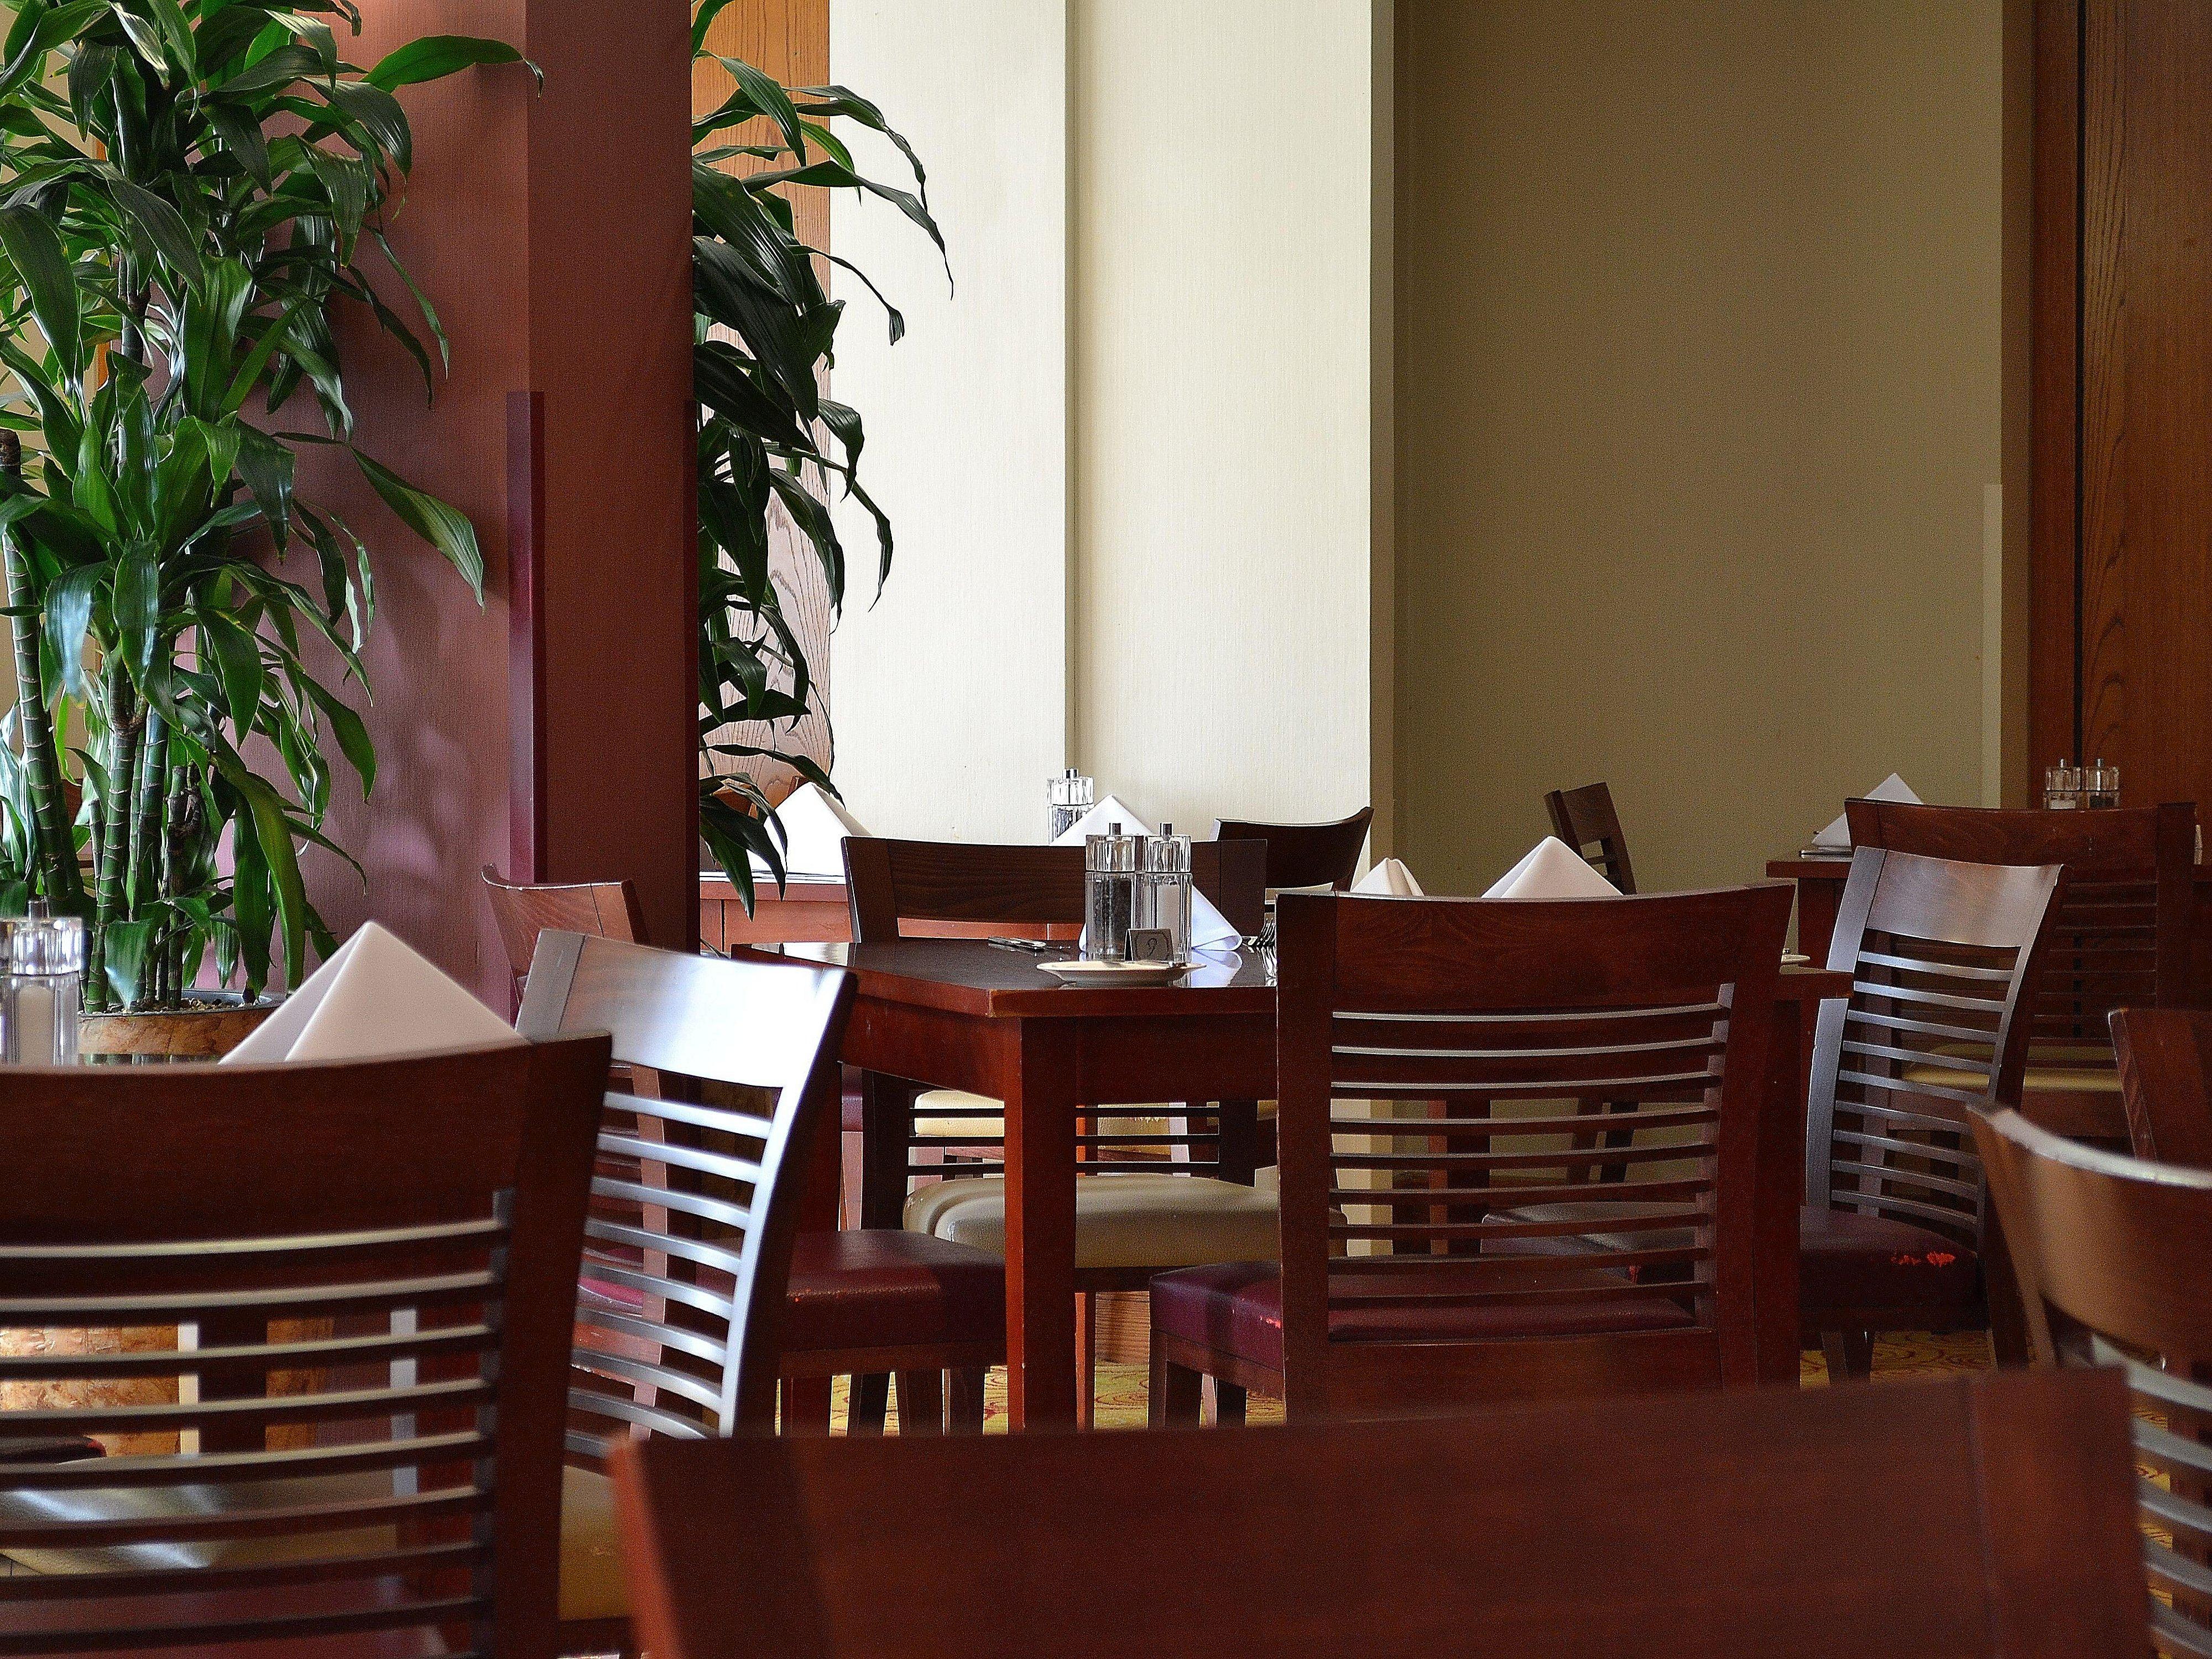 Hotels Near Northampton Centre: Holiday Inn Northampton